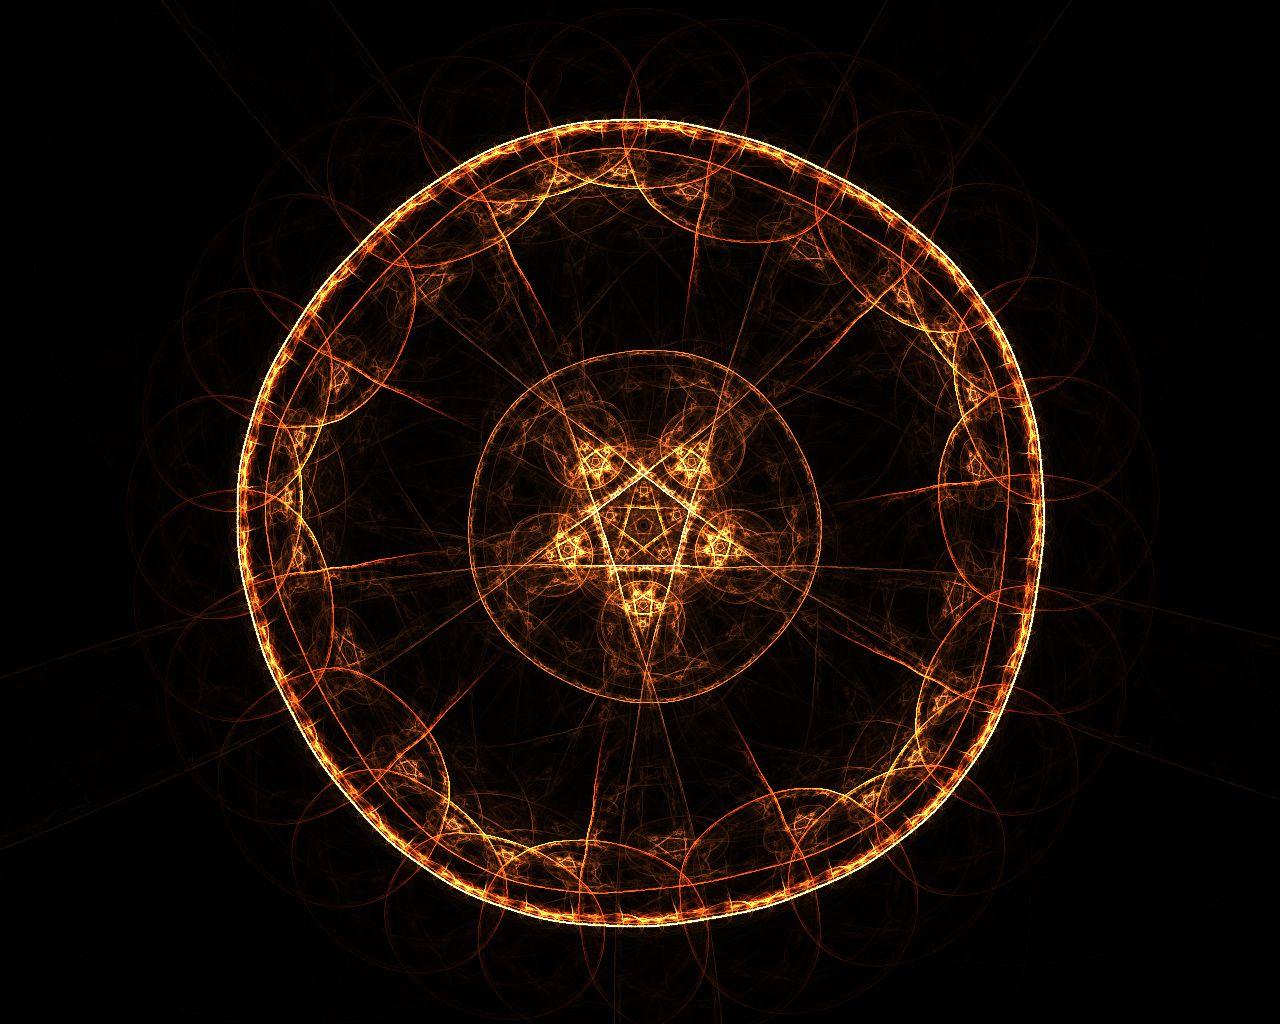 Pentagram Art | pentagram 2 by alchem digital art fractal art 2009 2014 alchem ...